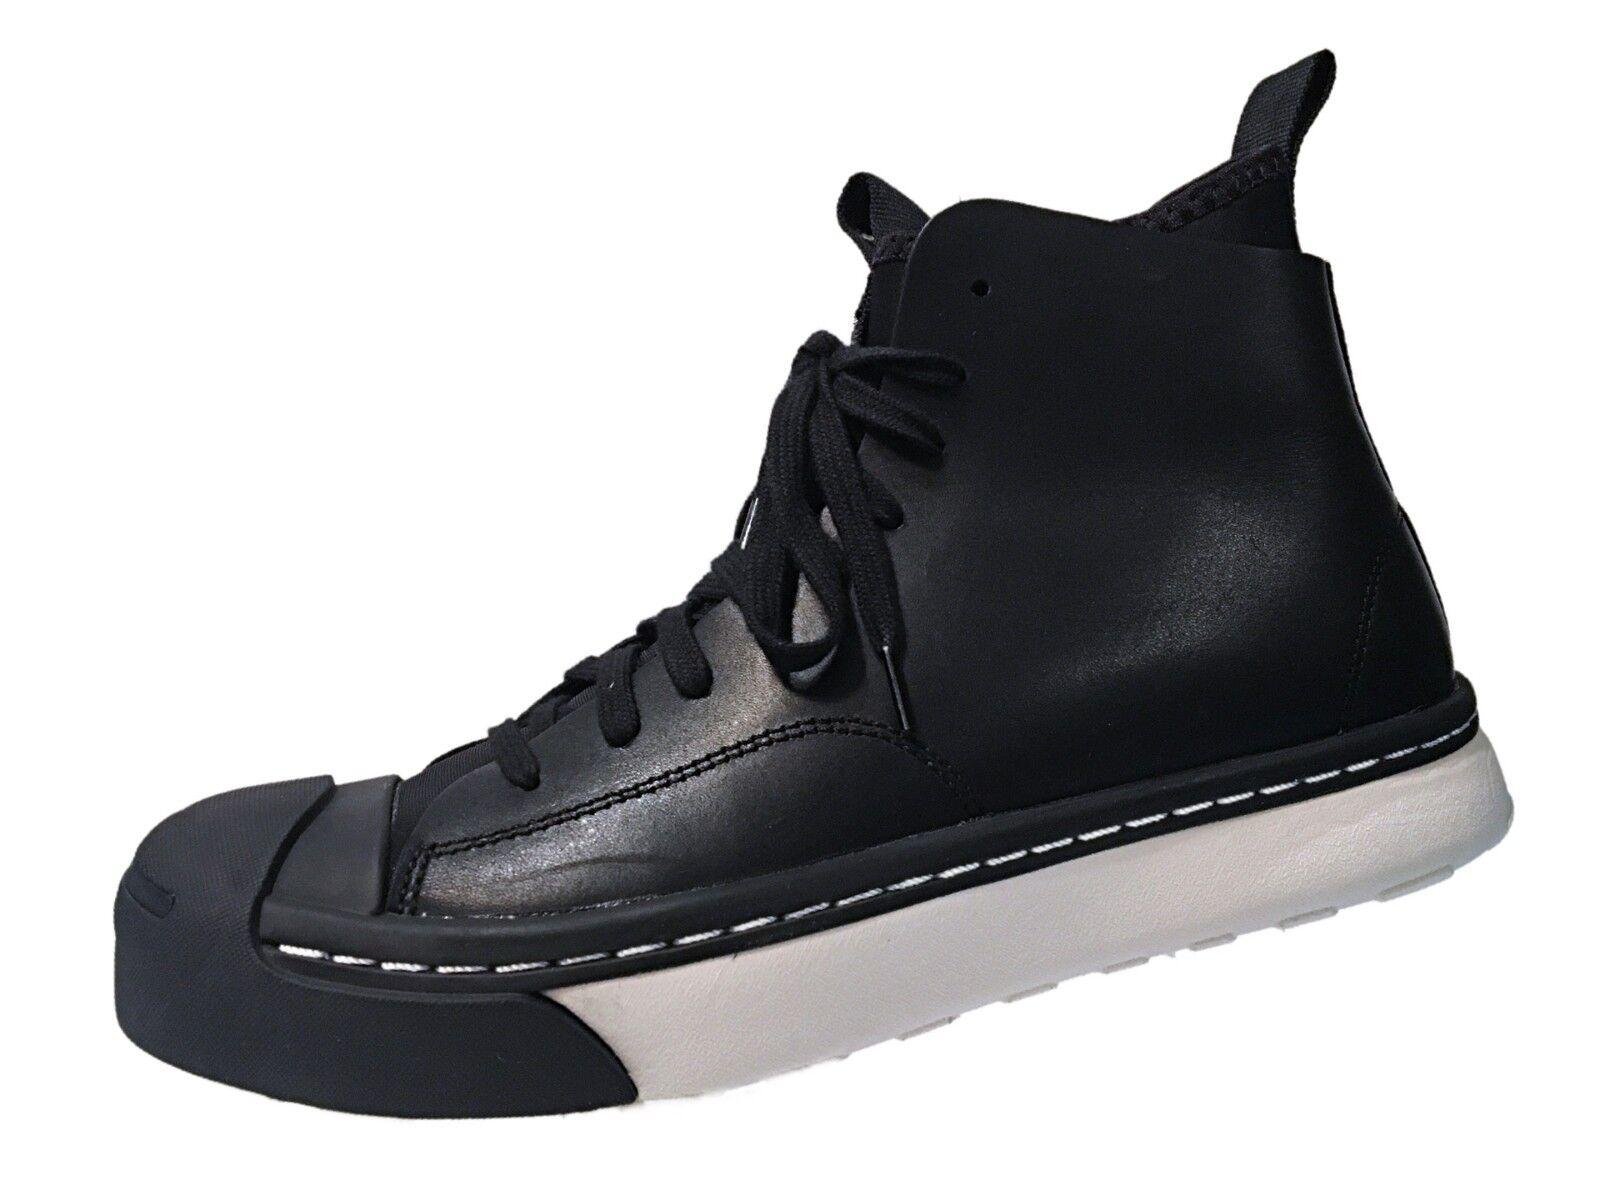 Converse Jack Purcell S Series Men's Women's Sneaker Boot Hi Black (153937C) New